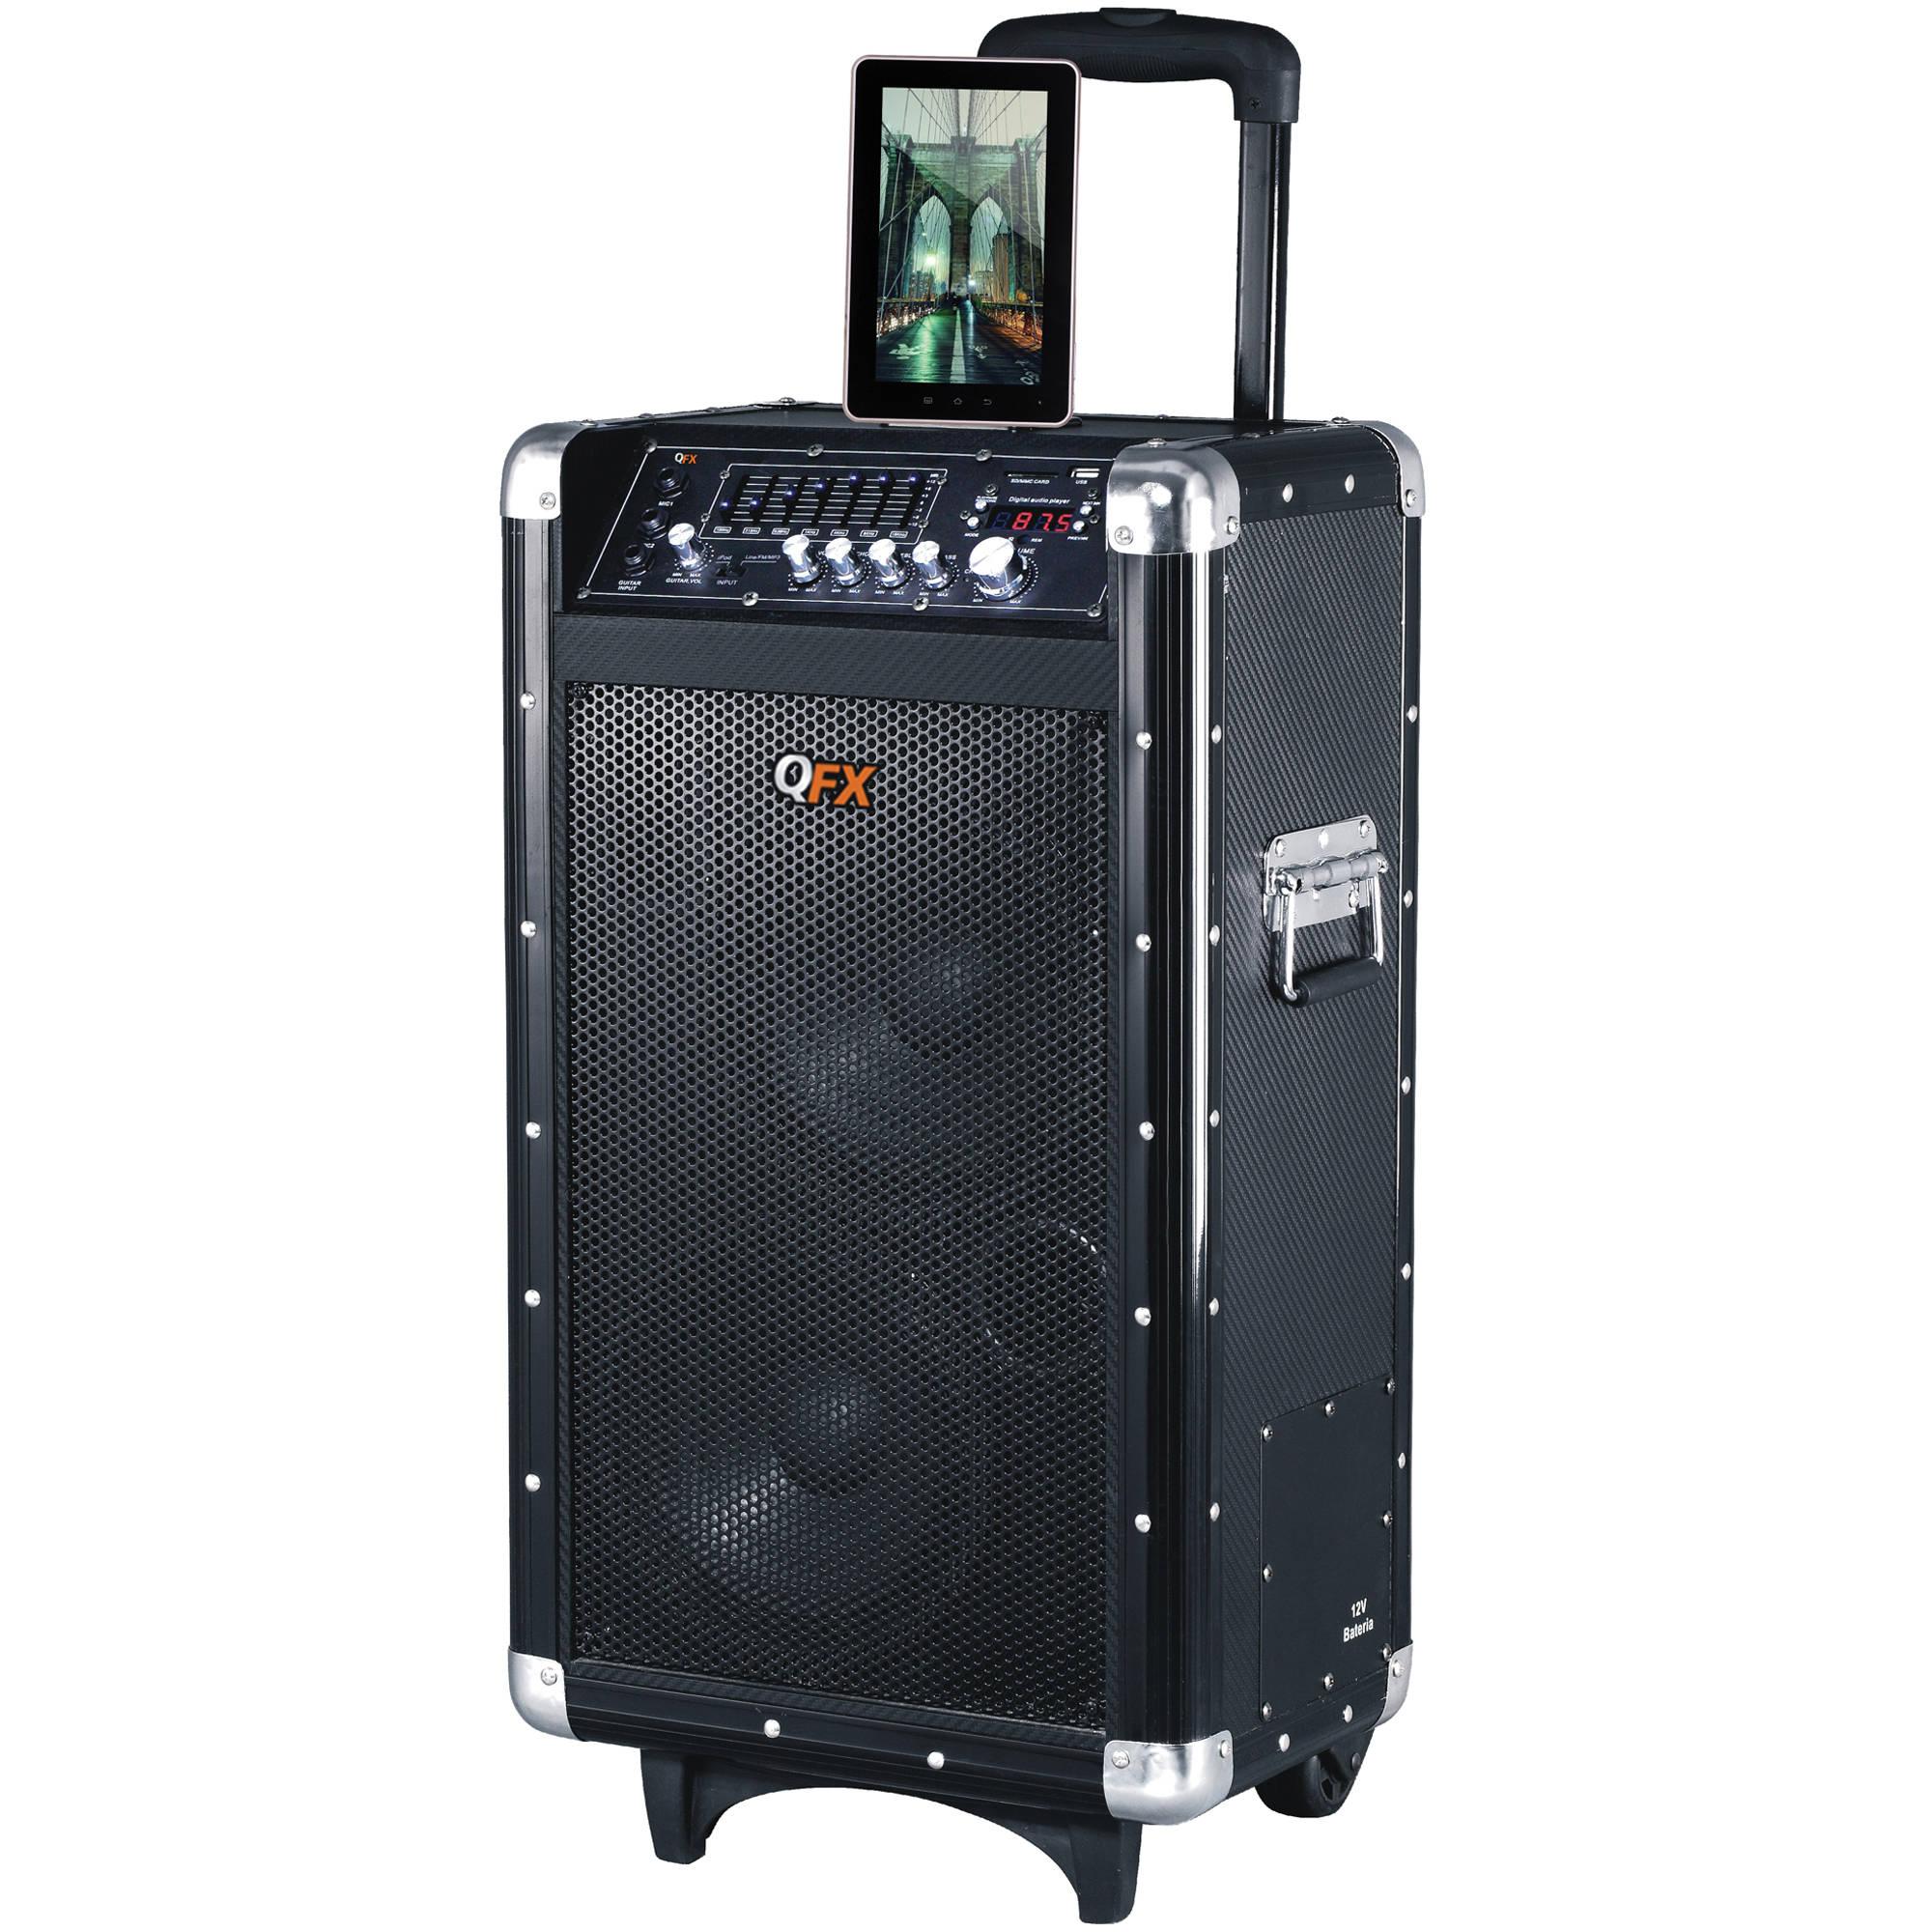 Bluetooth Speaker Portable Best: QFX PBX-3080BT Portable Bluetooth PA Speaker (Black) PBX 3080BT